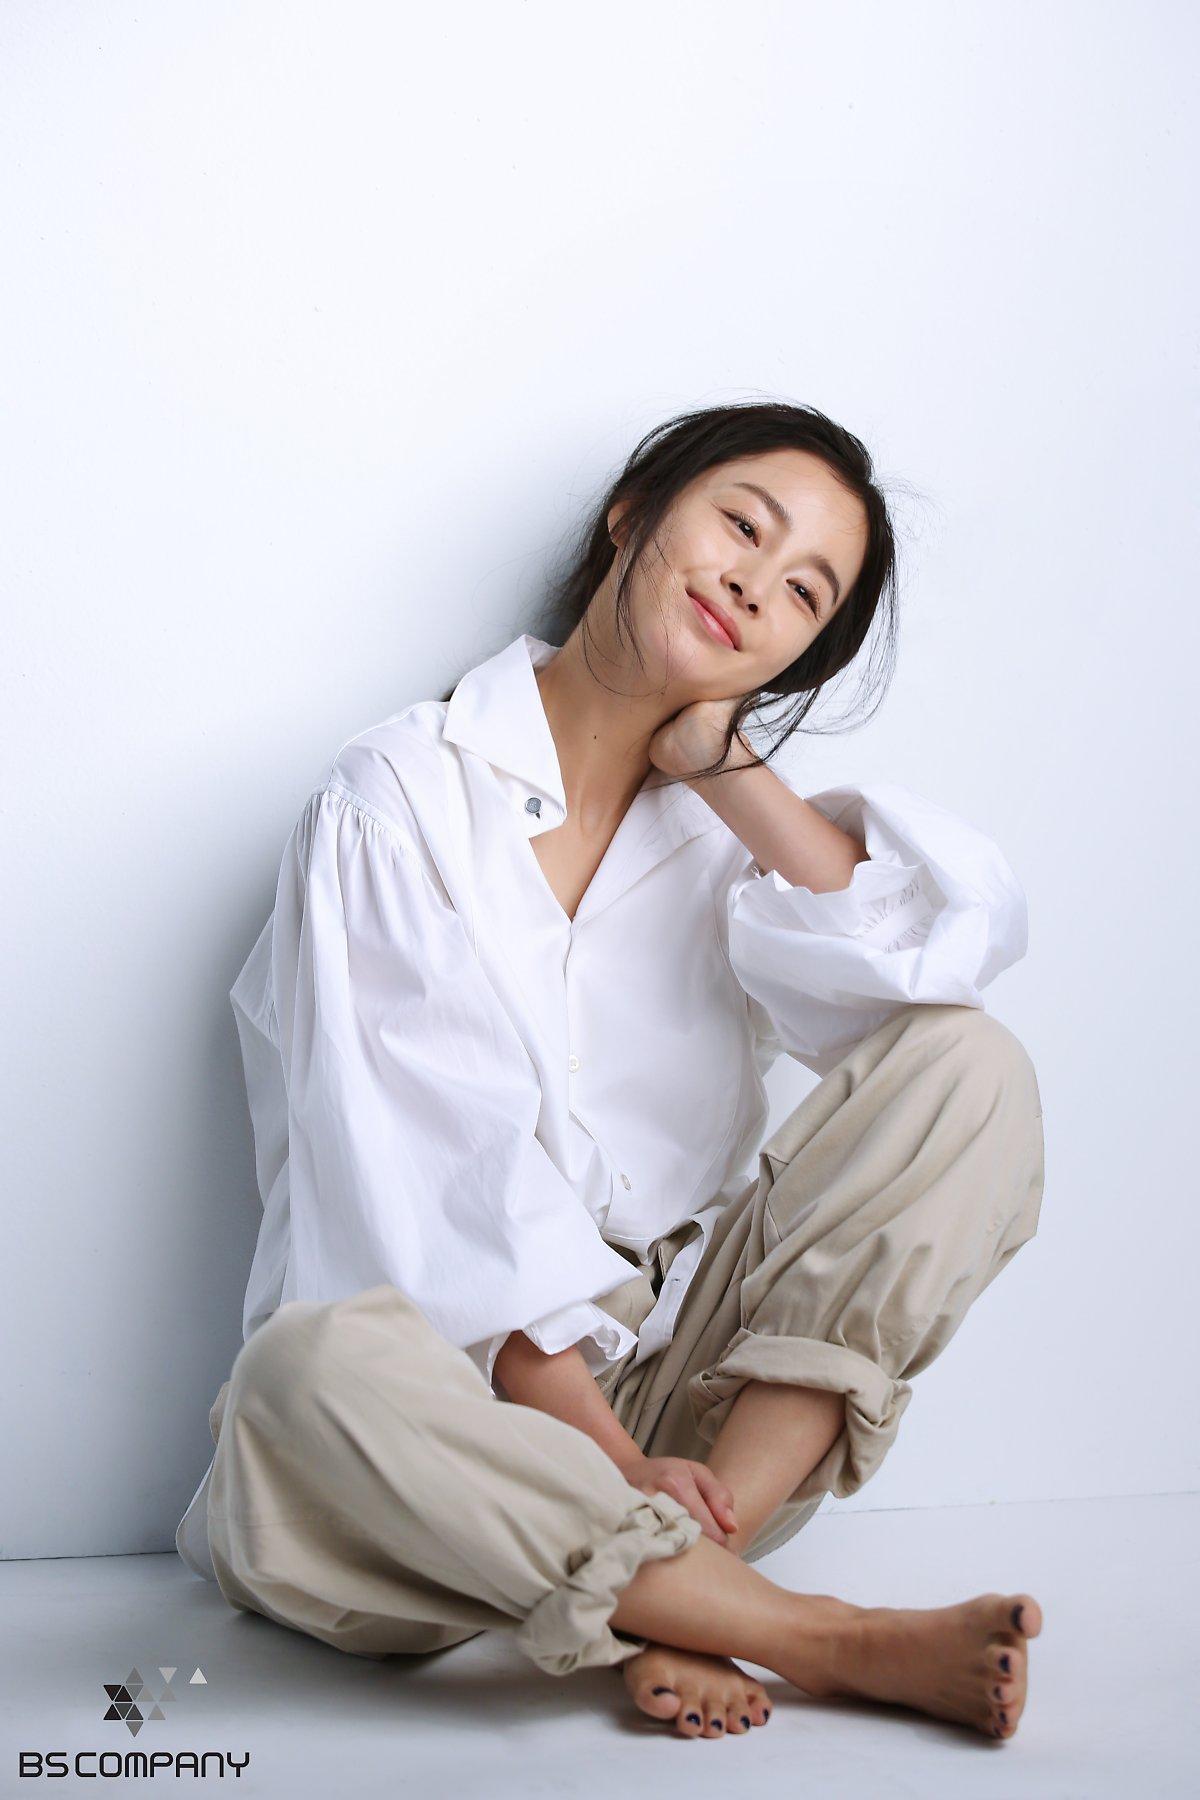 Kim Tae Hee * 김태희 * 金泰希 * キムテヒ - Page 1328 - actors & actresses